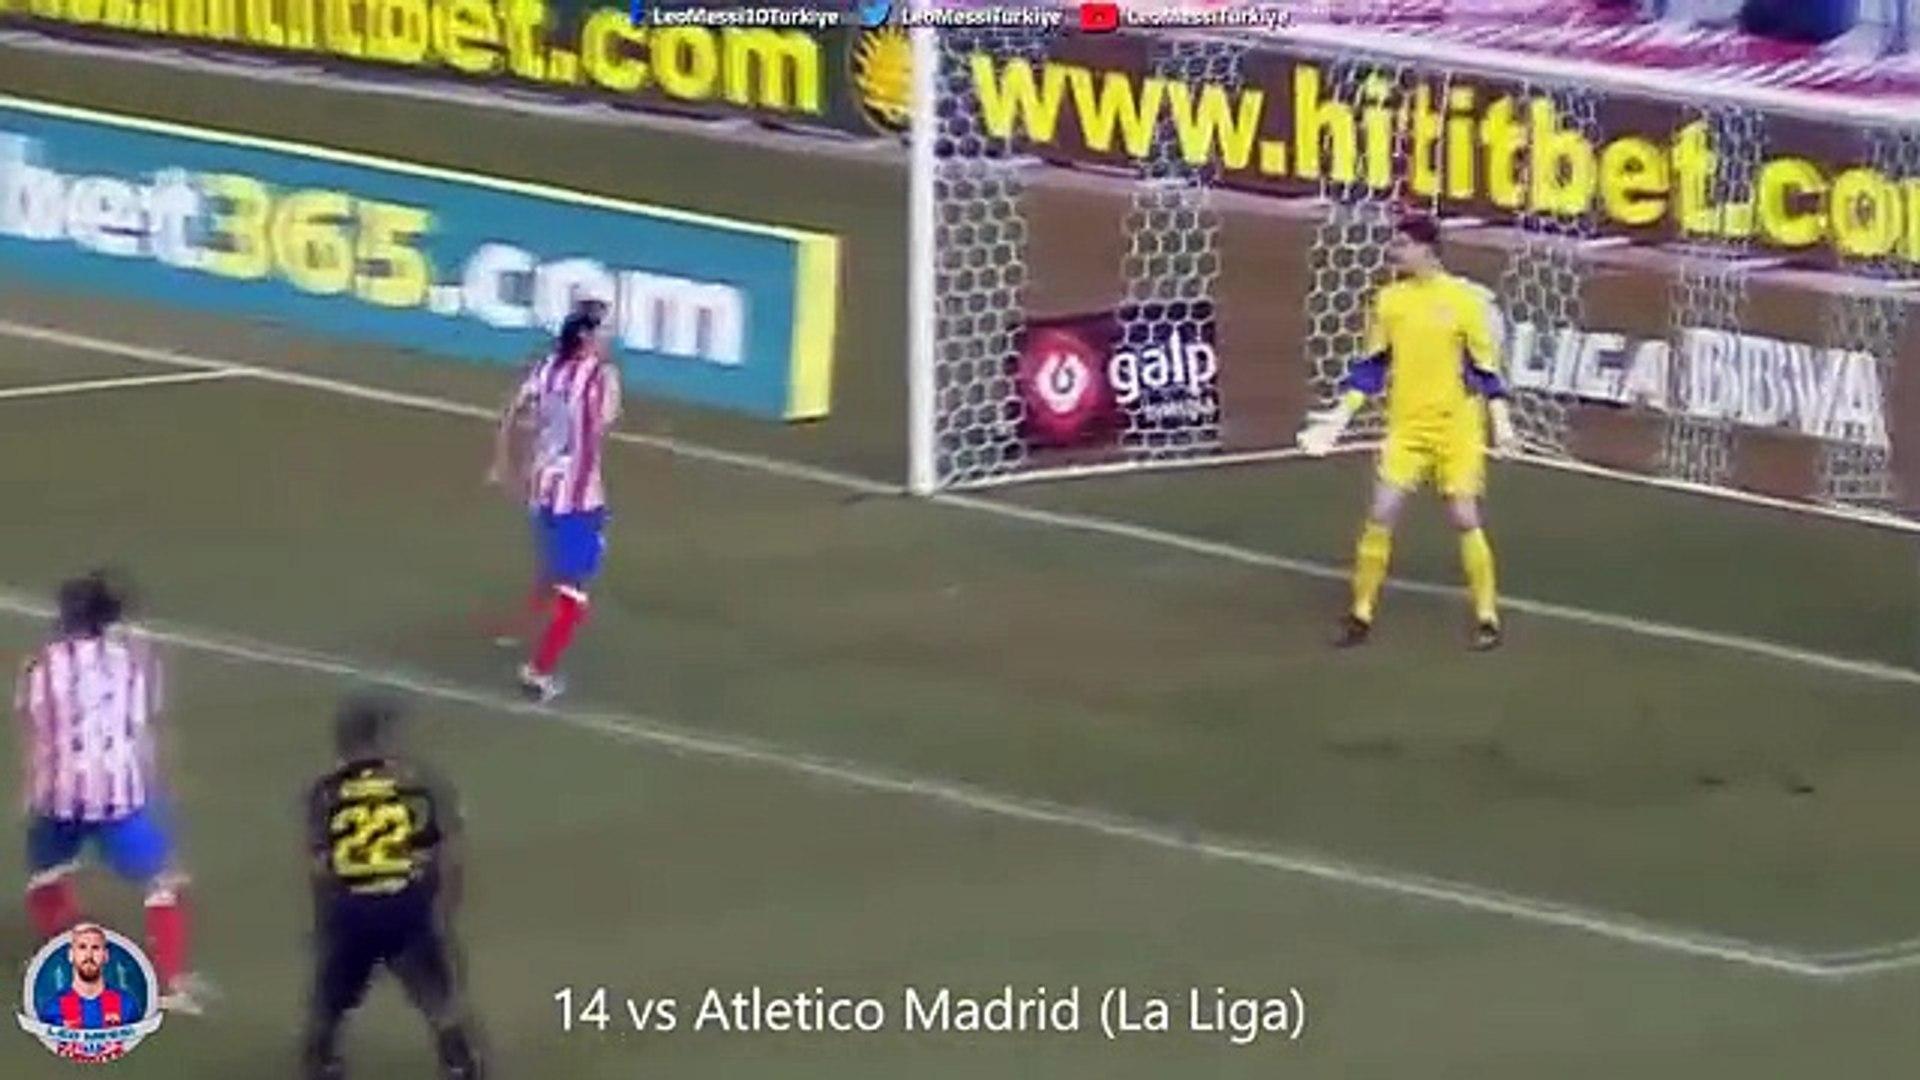 Lionel Messi - Bir Yılda 91 Gol (new) - Guinness Dünya Rekoru • HD